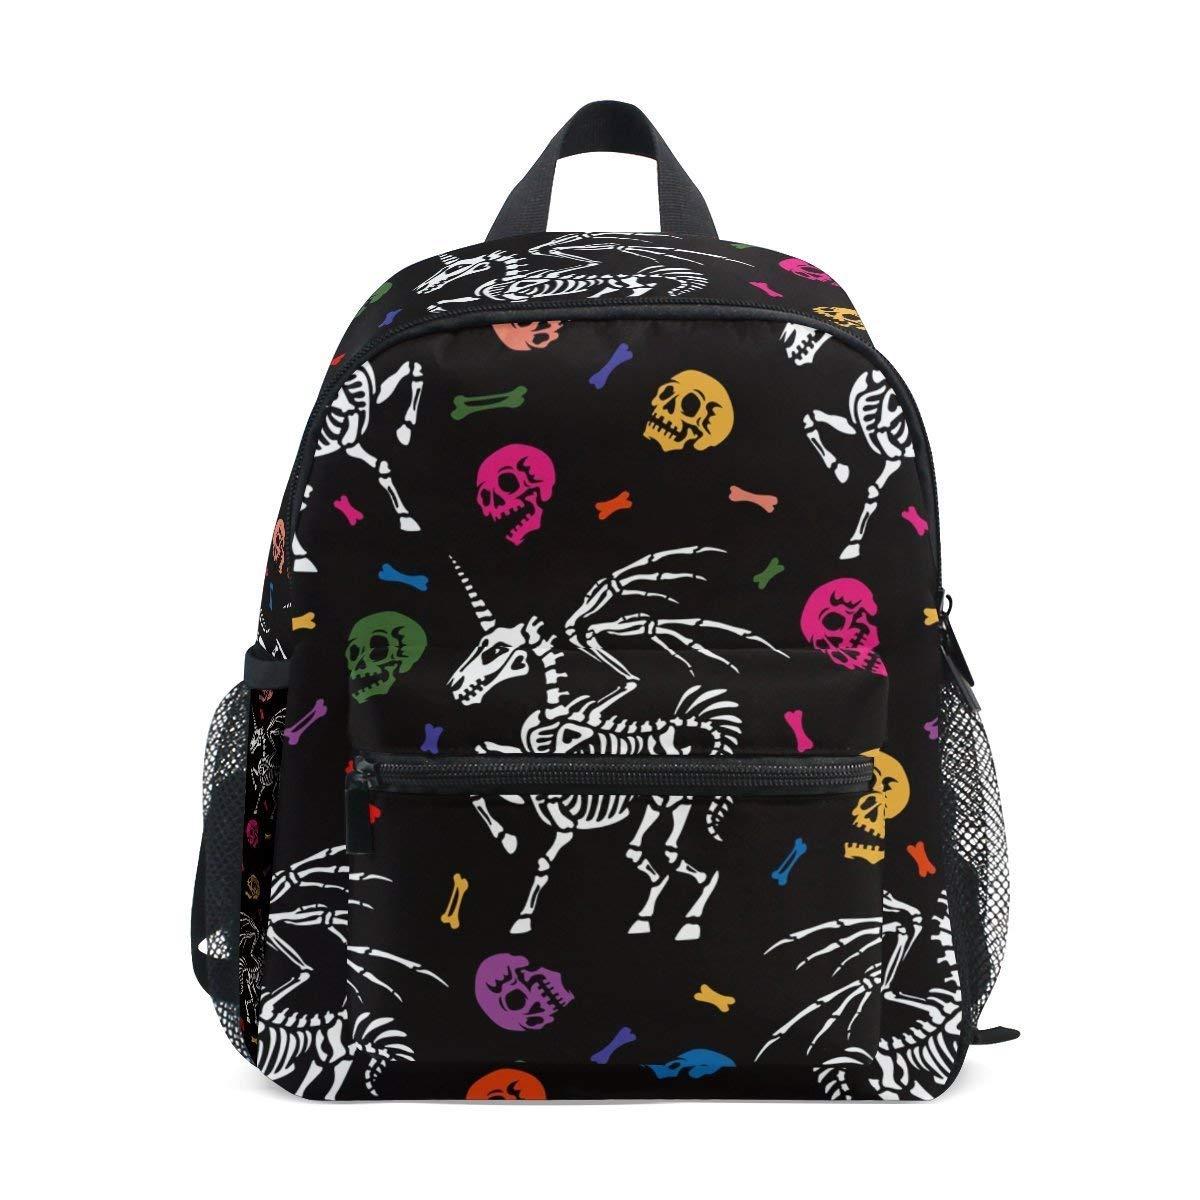 Unicorn Skull Backpack,Waterproof Bag Printing Design Fabric Lightweight Daypack for Travel, School and Sports Shoulder Bag